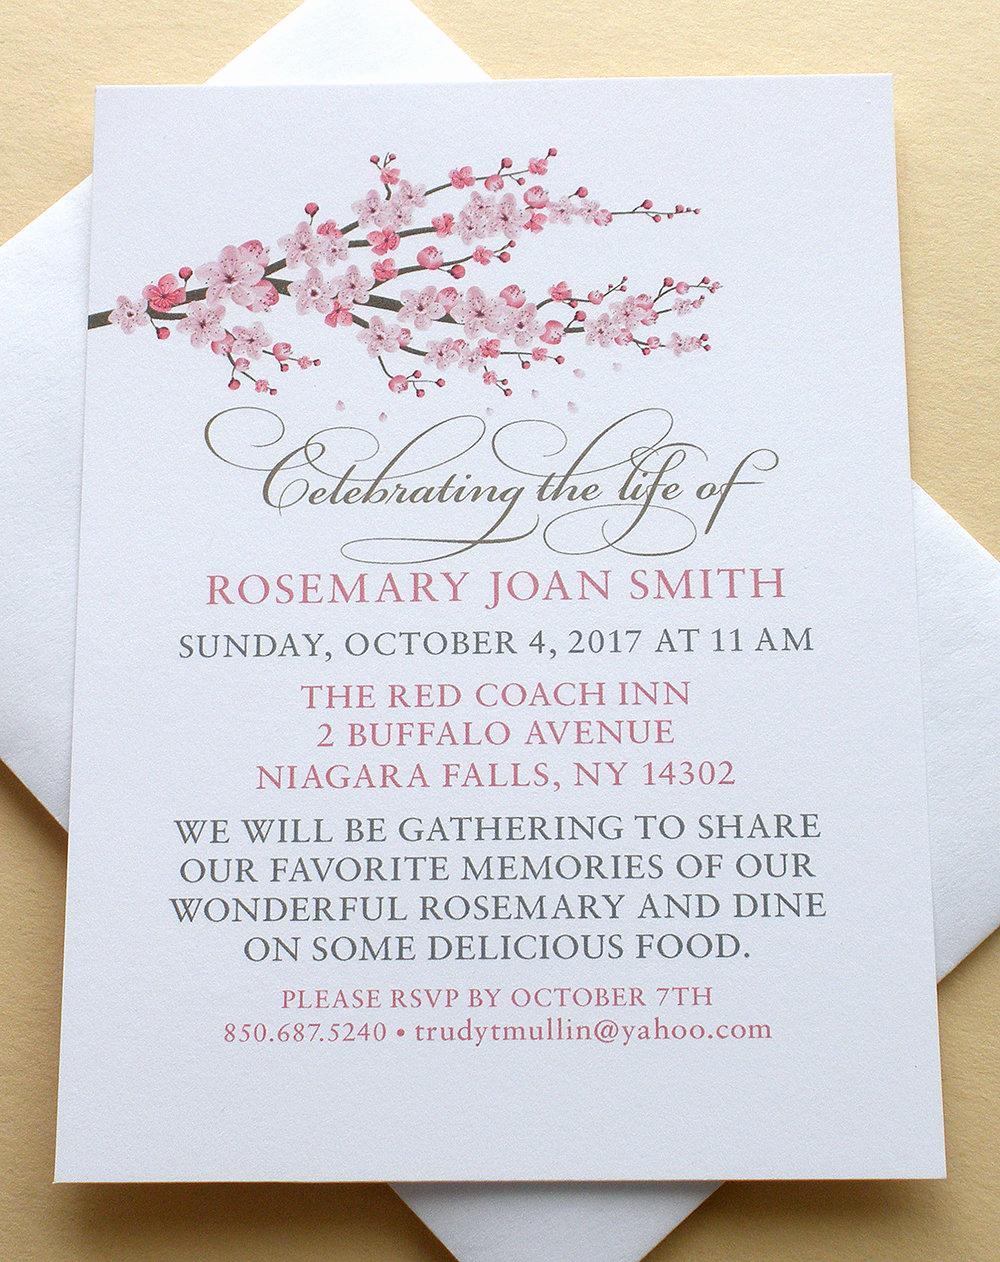 Celebration Of Life Invitation Wording Best Of Celebration Of Life Invitations with A Branch Of Pink Blossoms